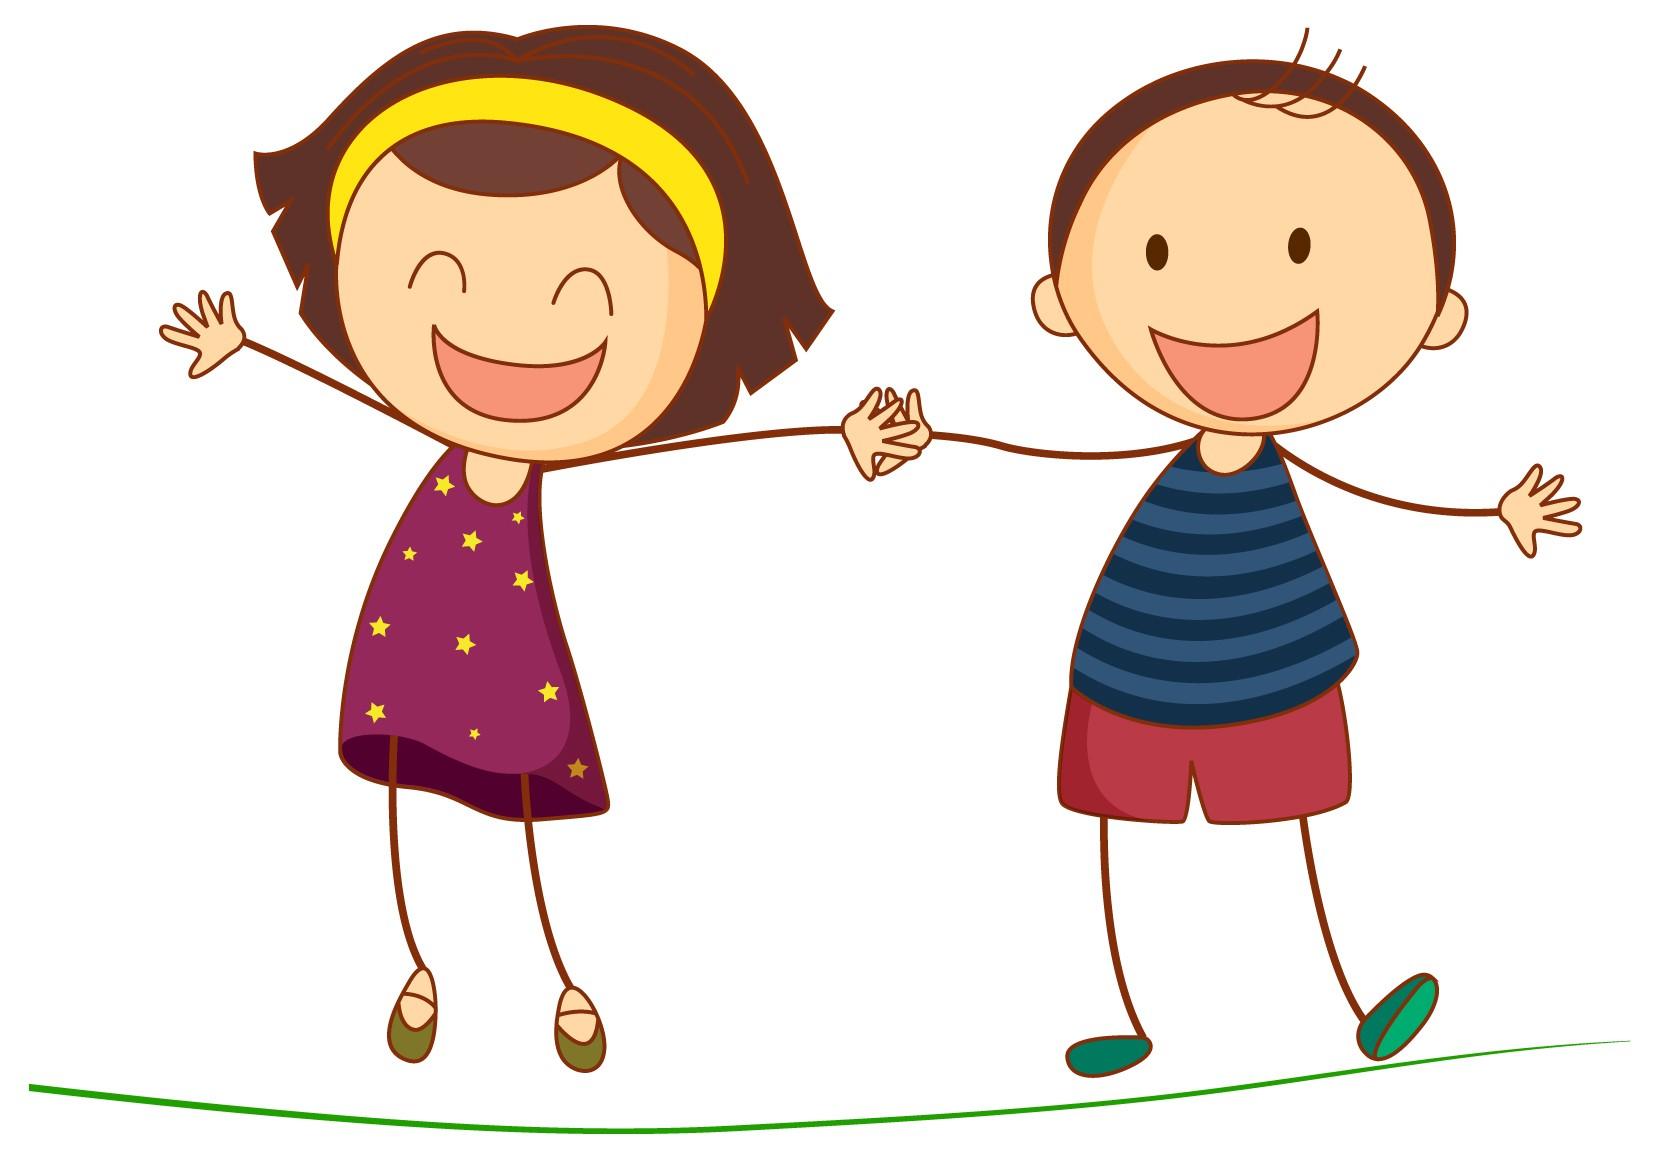 Happy Kids Cartoon - ClipArt Best